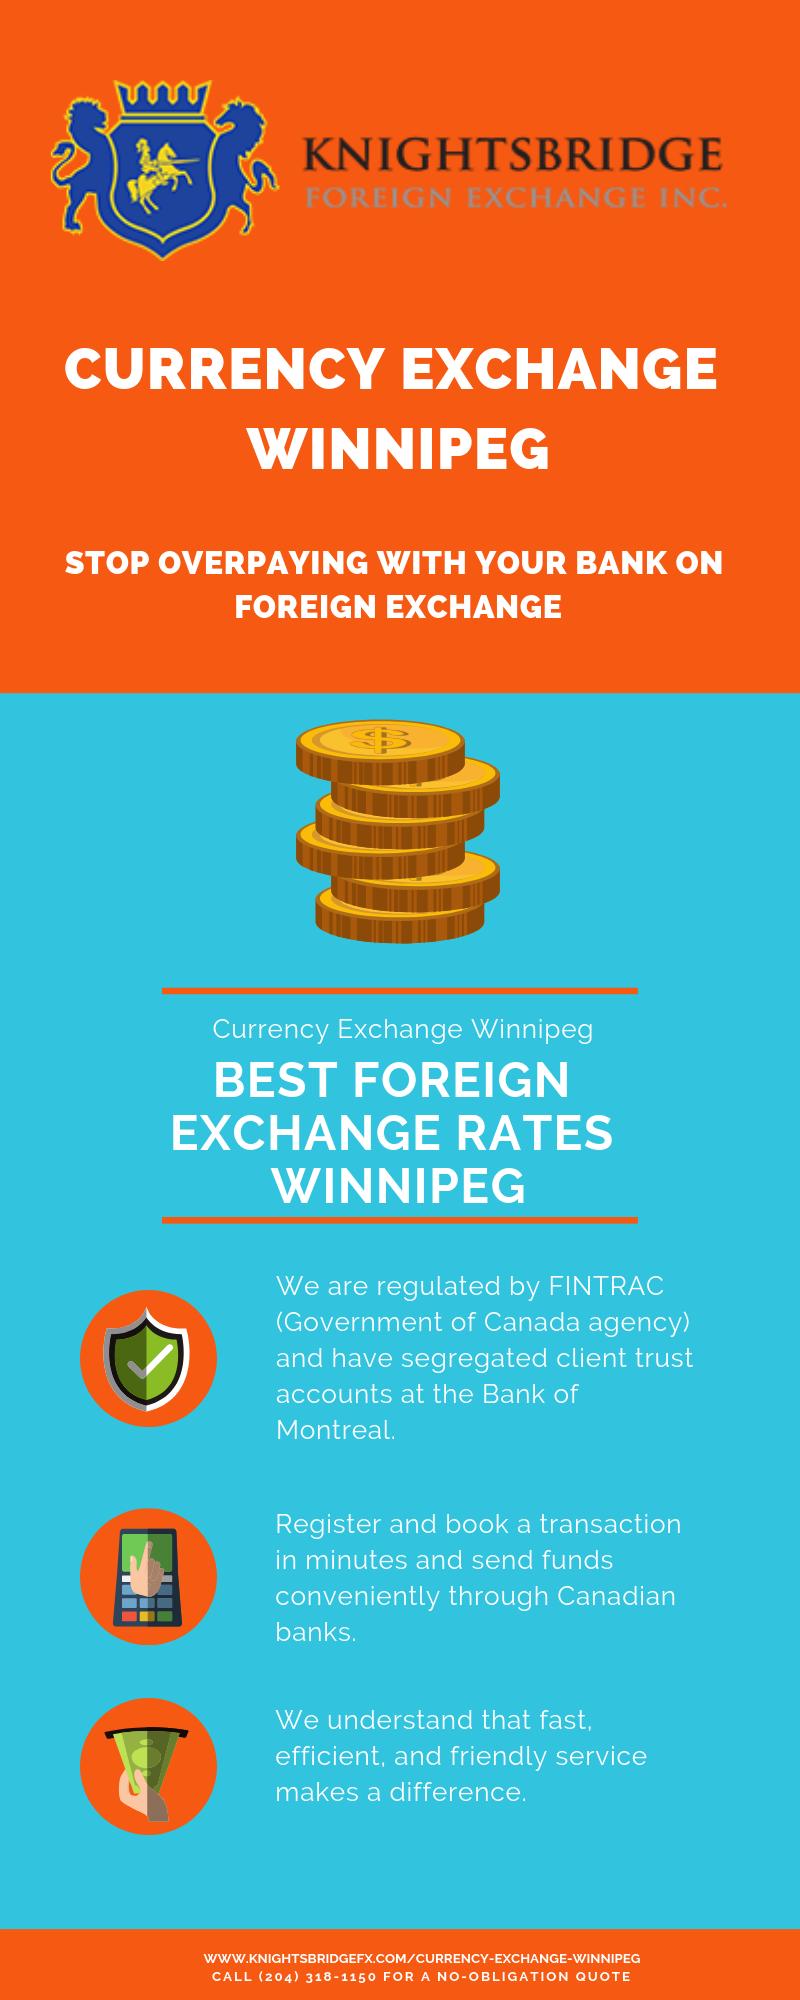 Best Foreign Exchange Rates Winnipeg